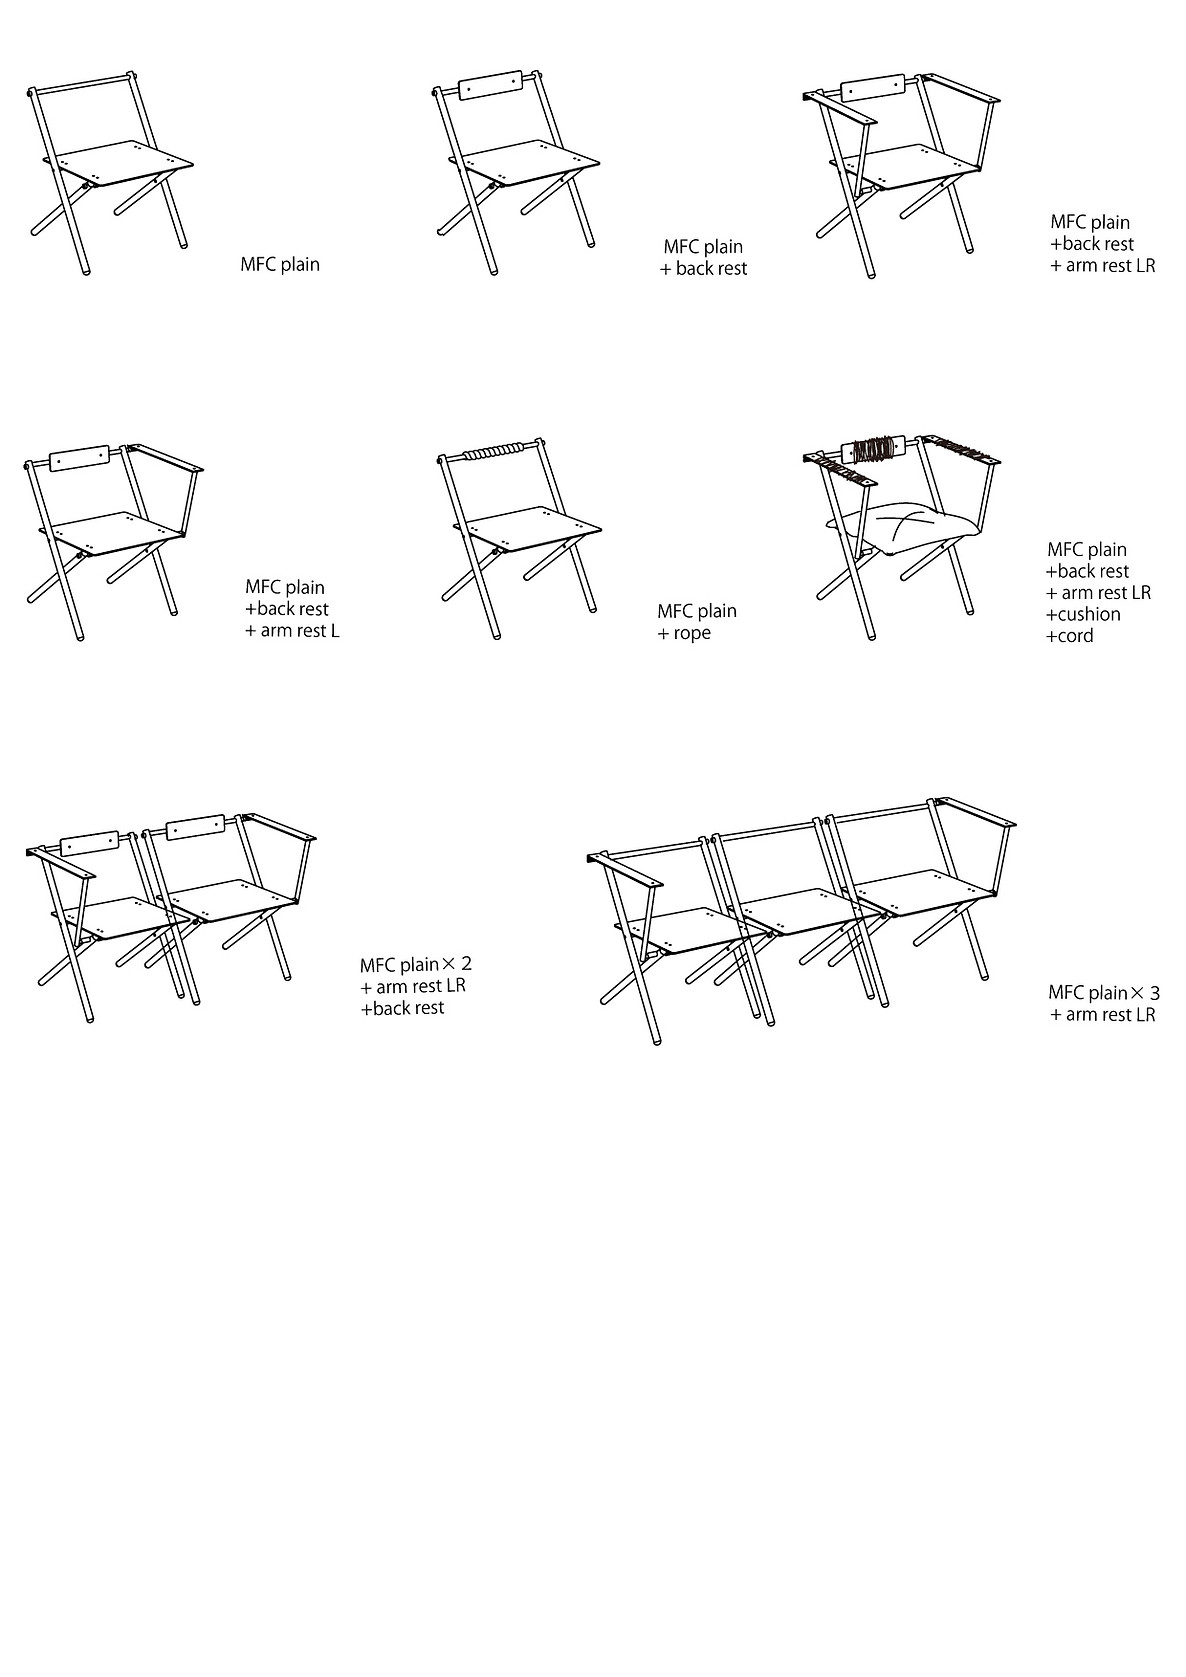 mfc_example-12.jpg